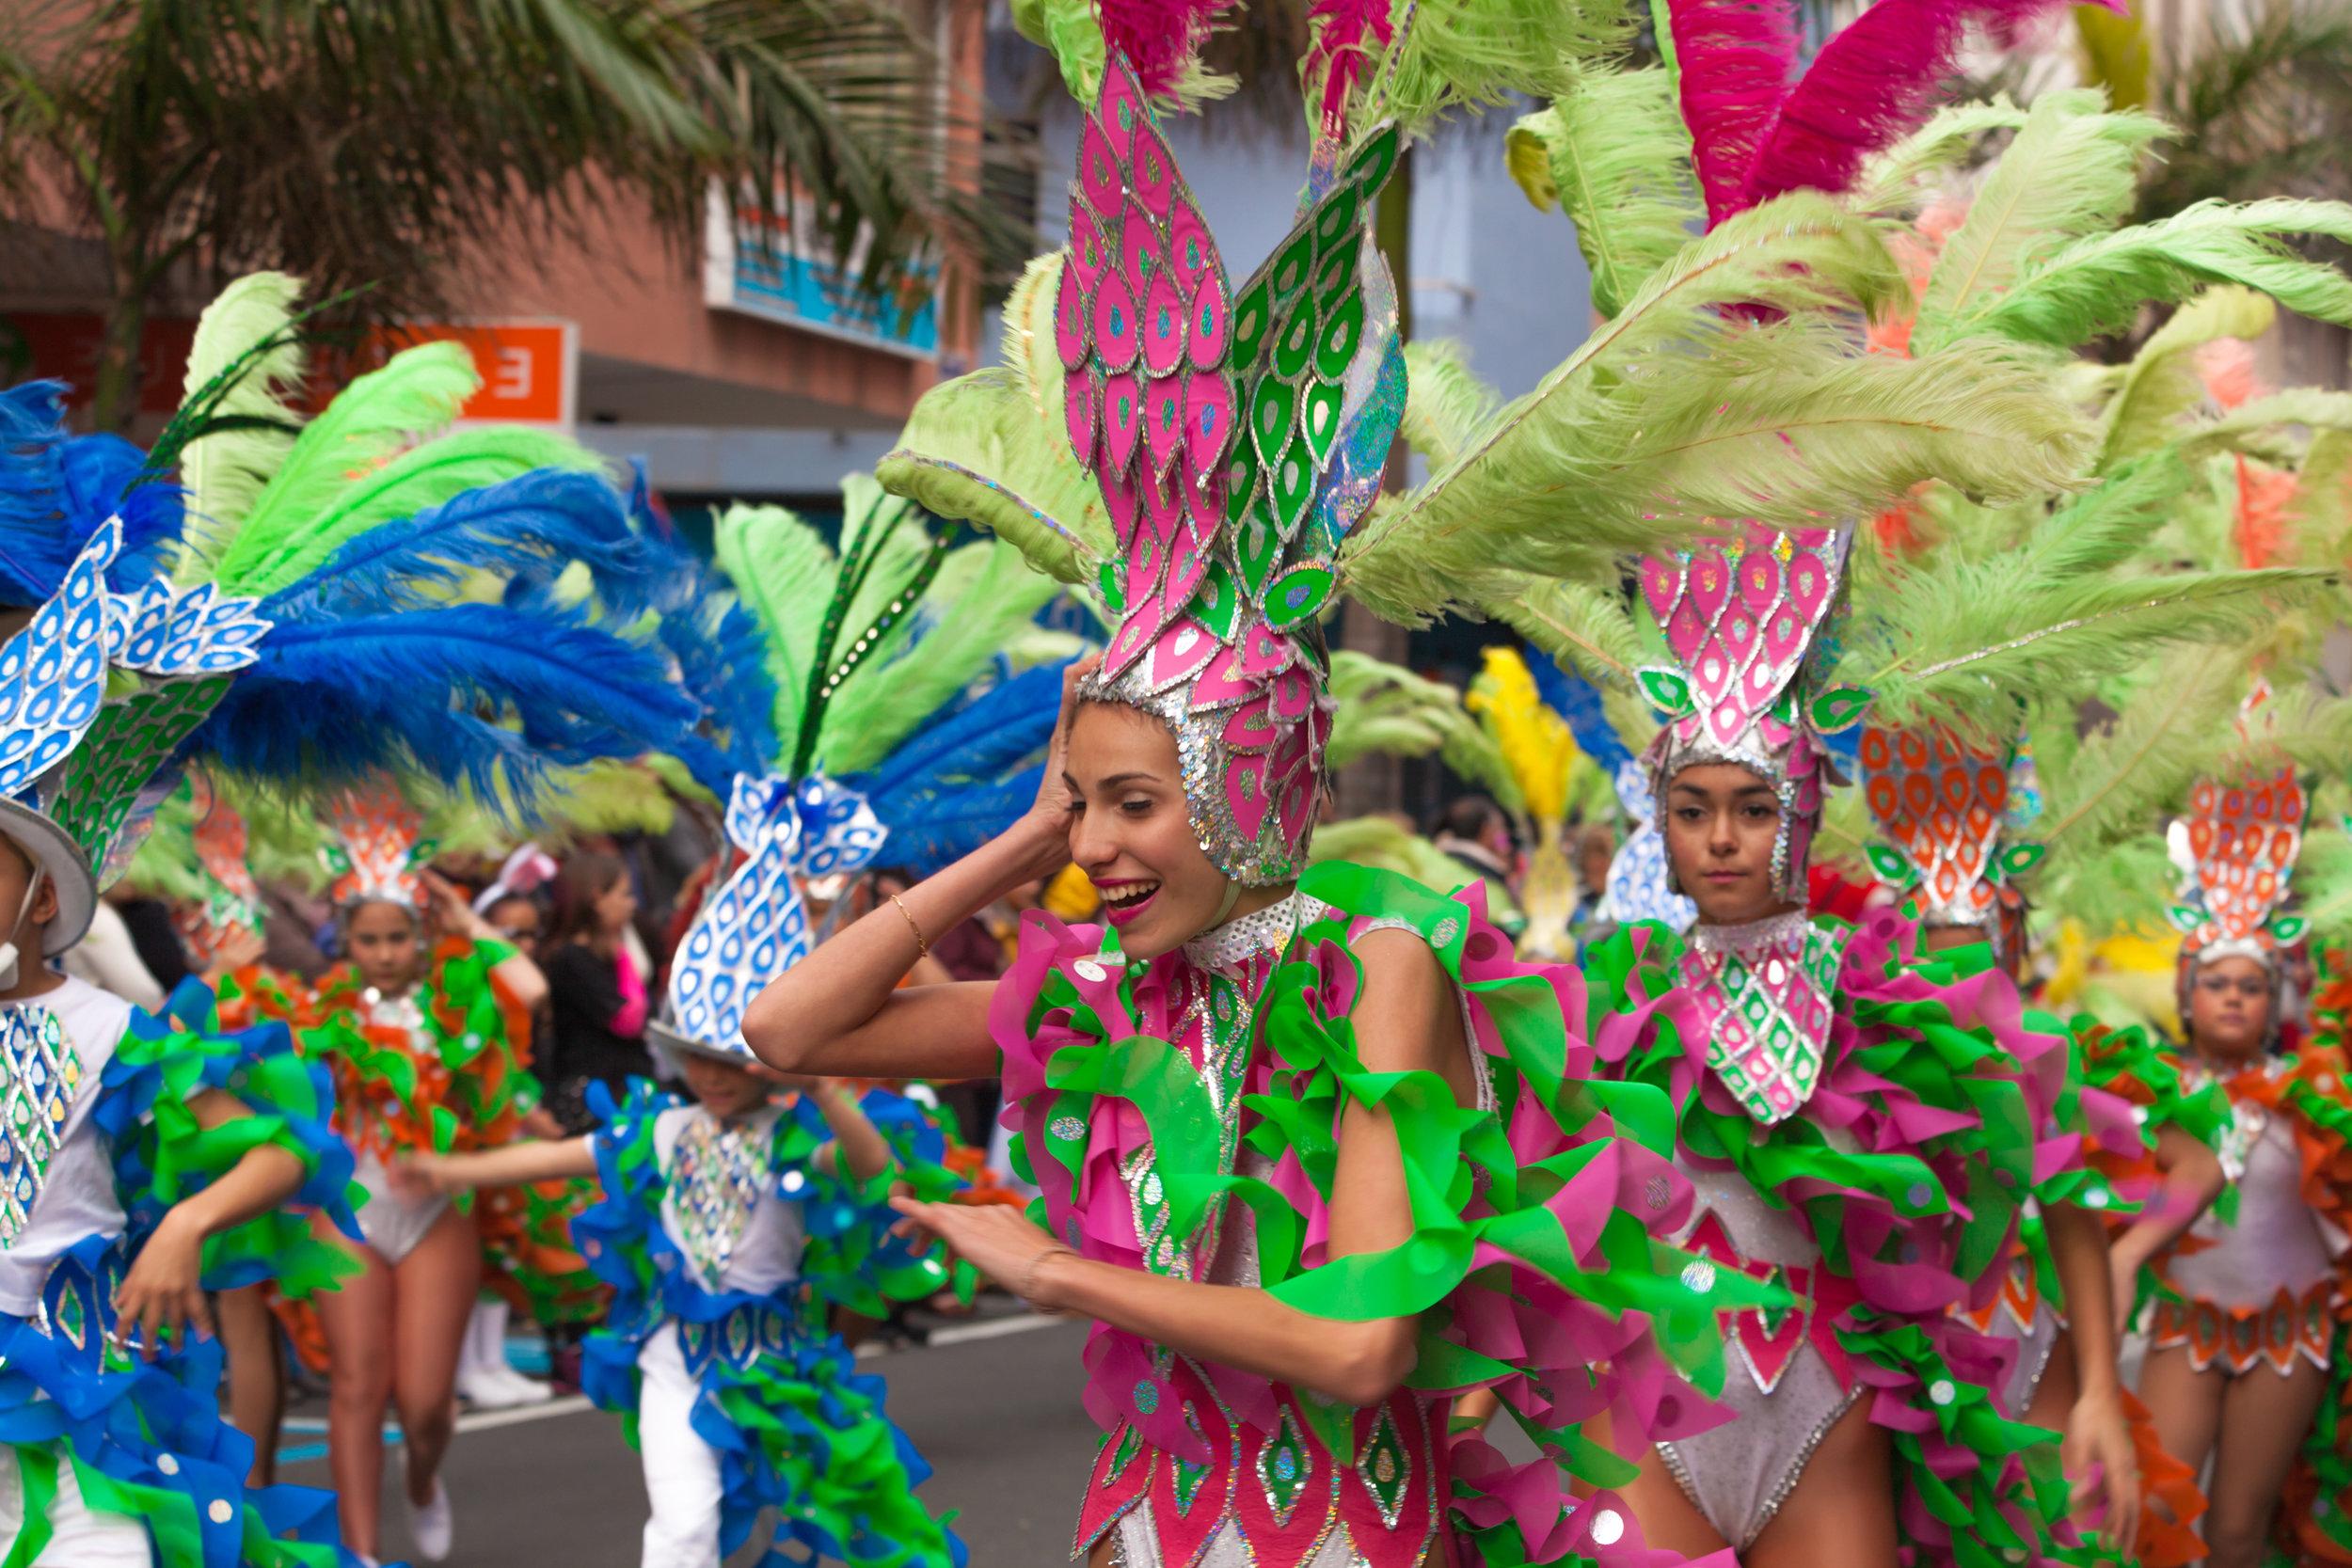 Carnival clipart carnival parade. Los angeles childerncarnivalparadedancinggroup copyjpg